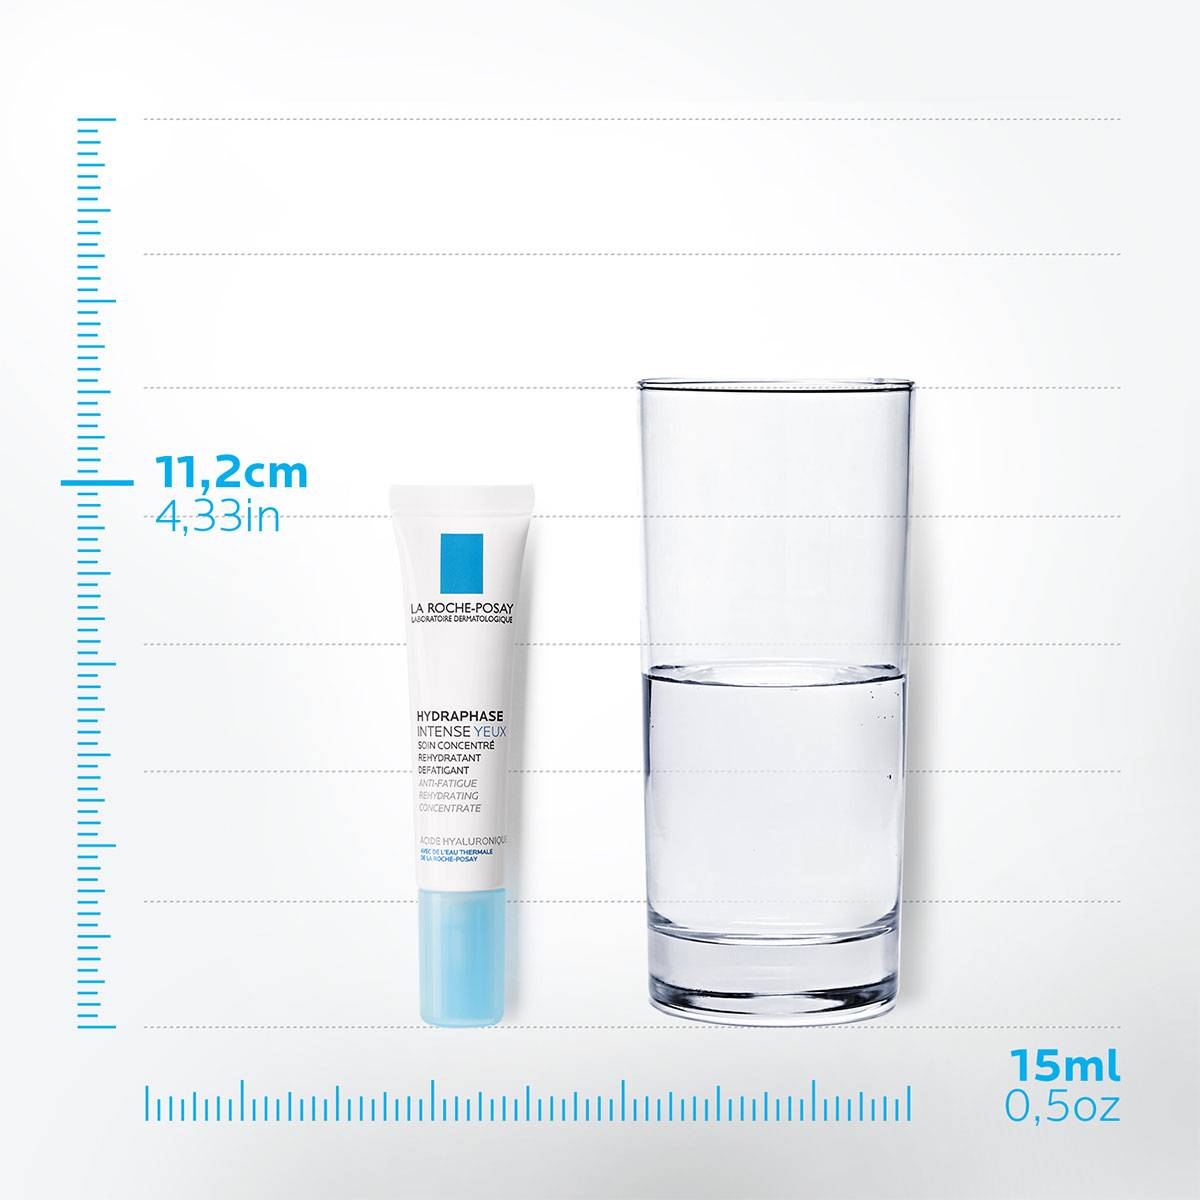 Hydraphase Intense Yeux 15 ml | La Roche Posay